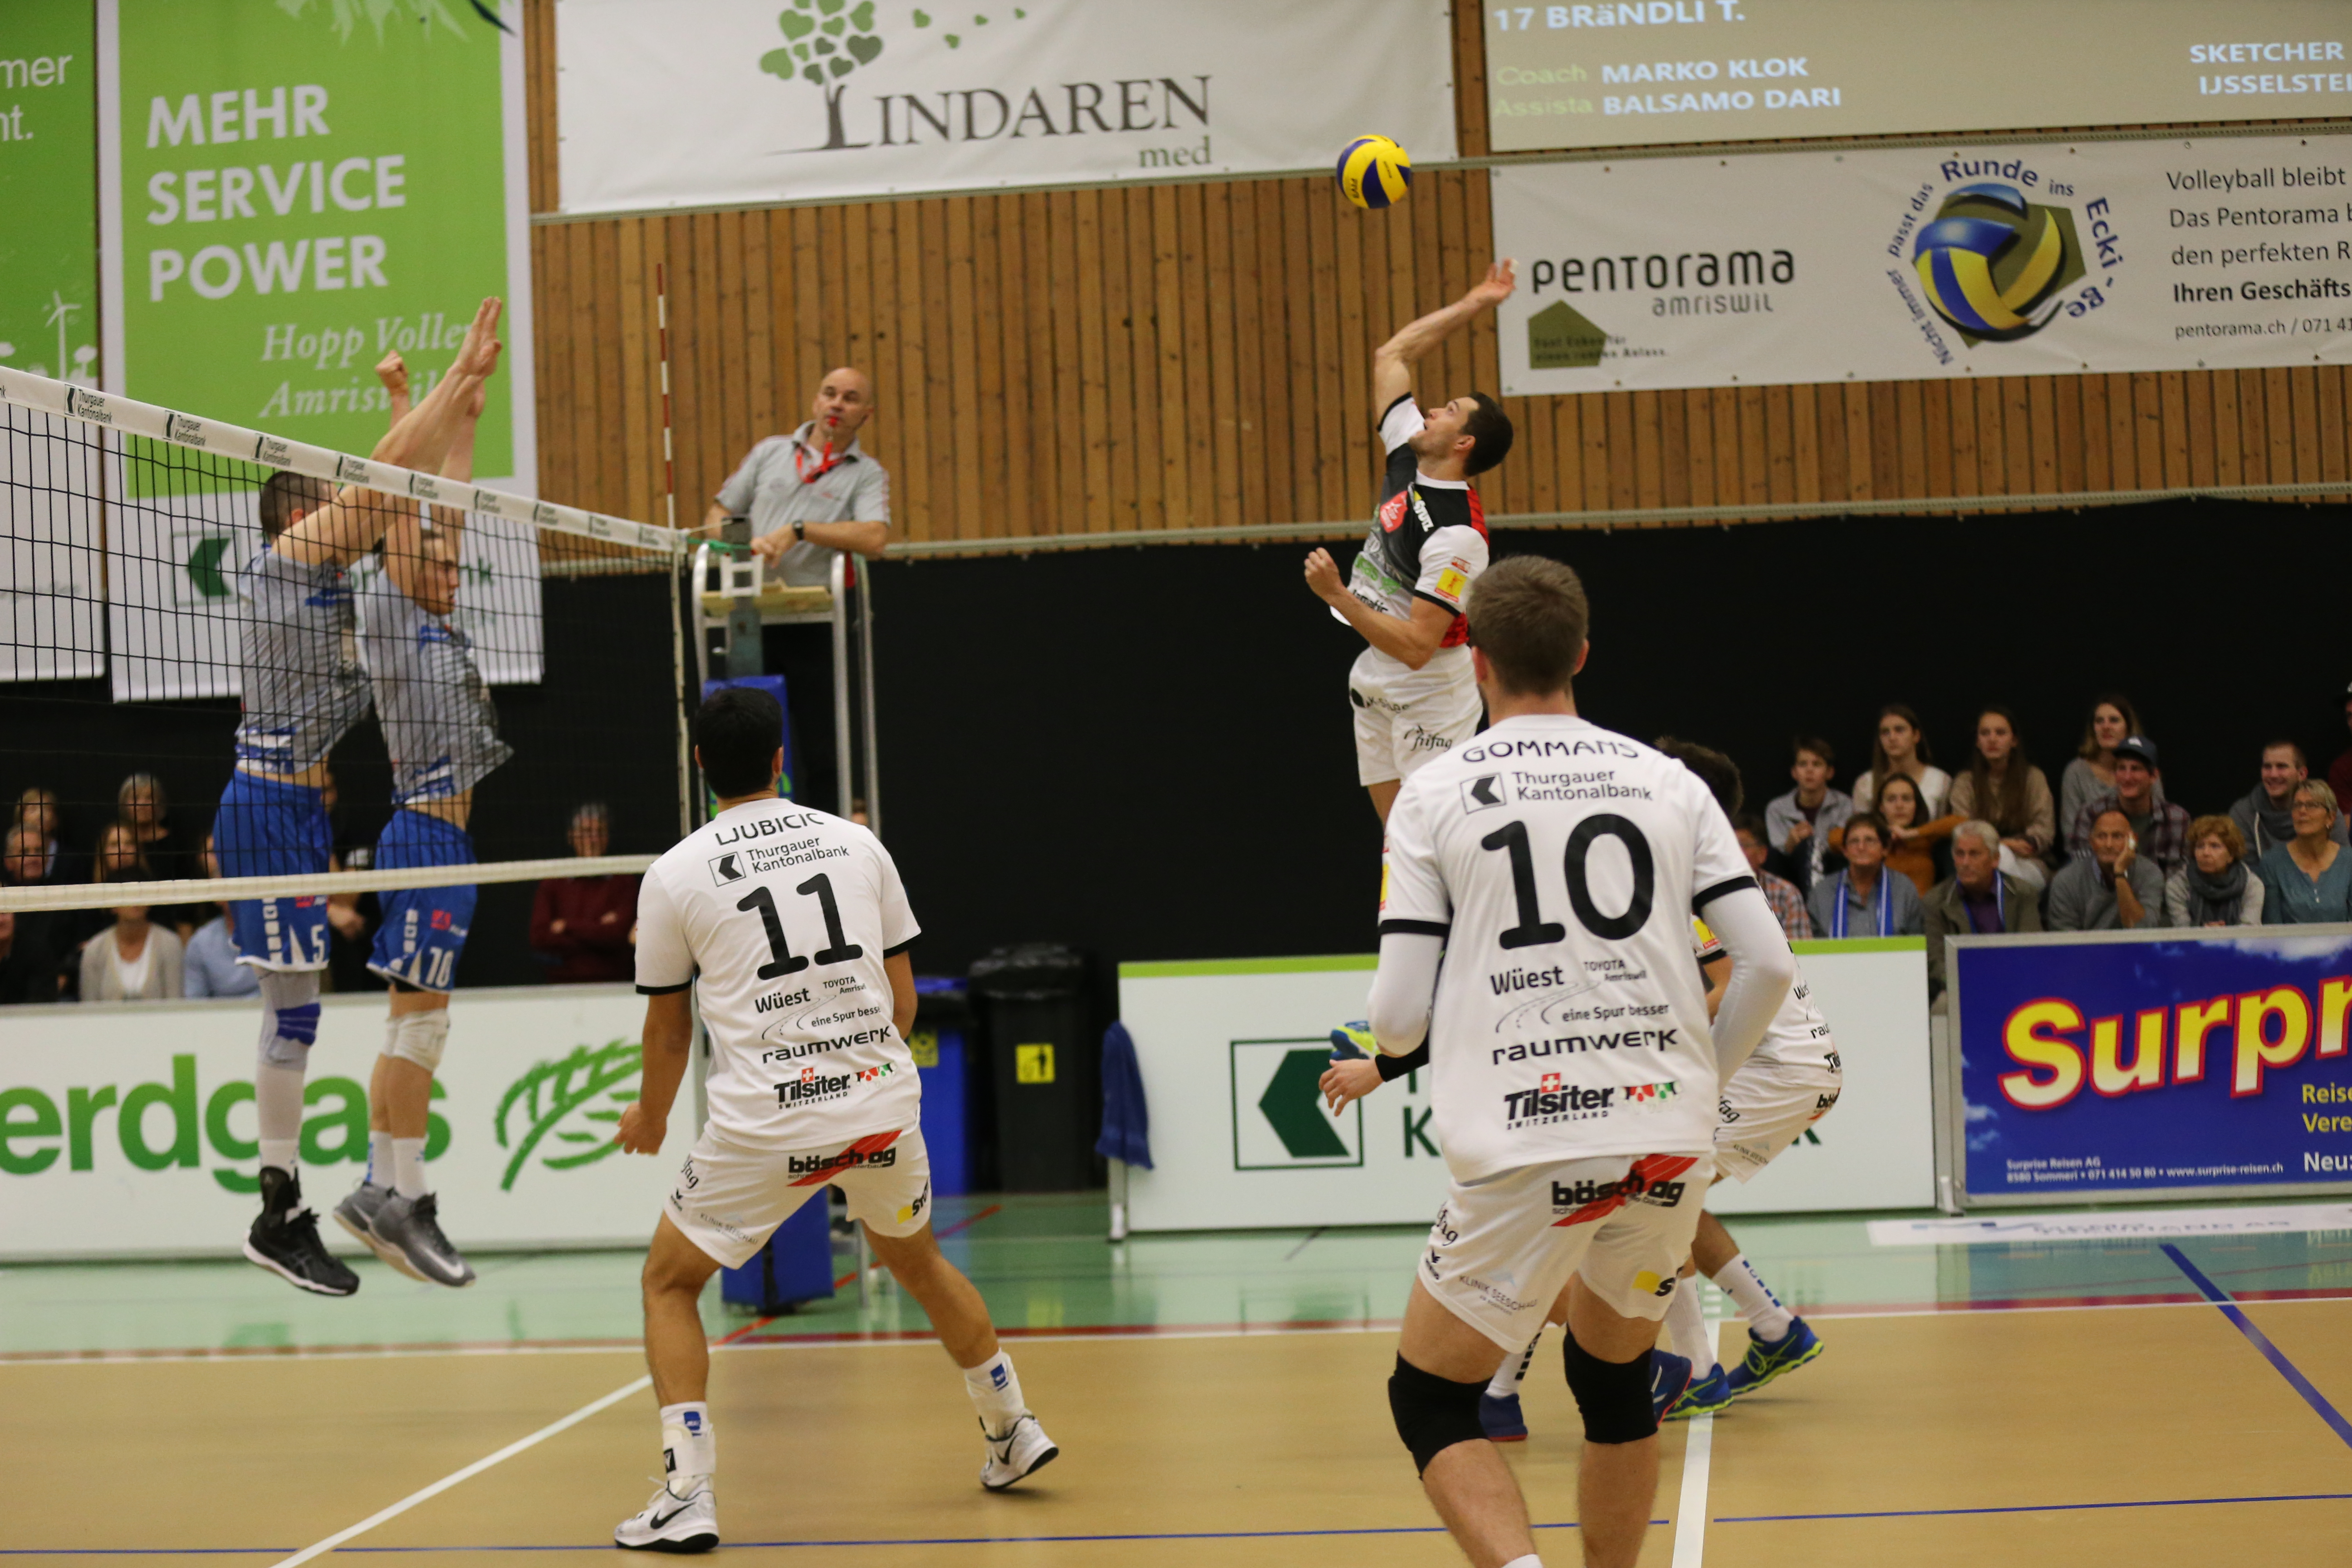 LINDAREN Volley Amriswil - Biogas Volley Näfels